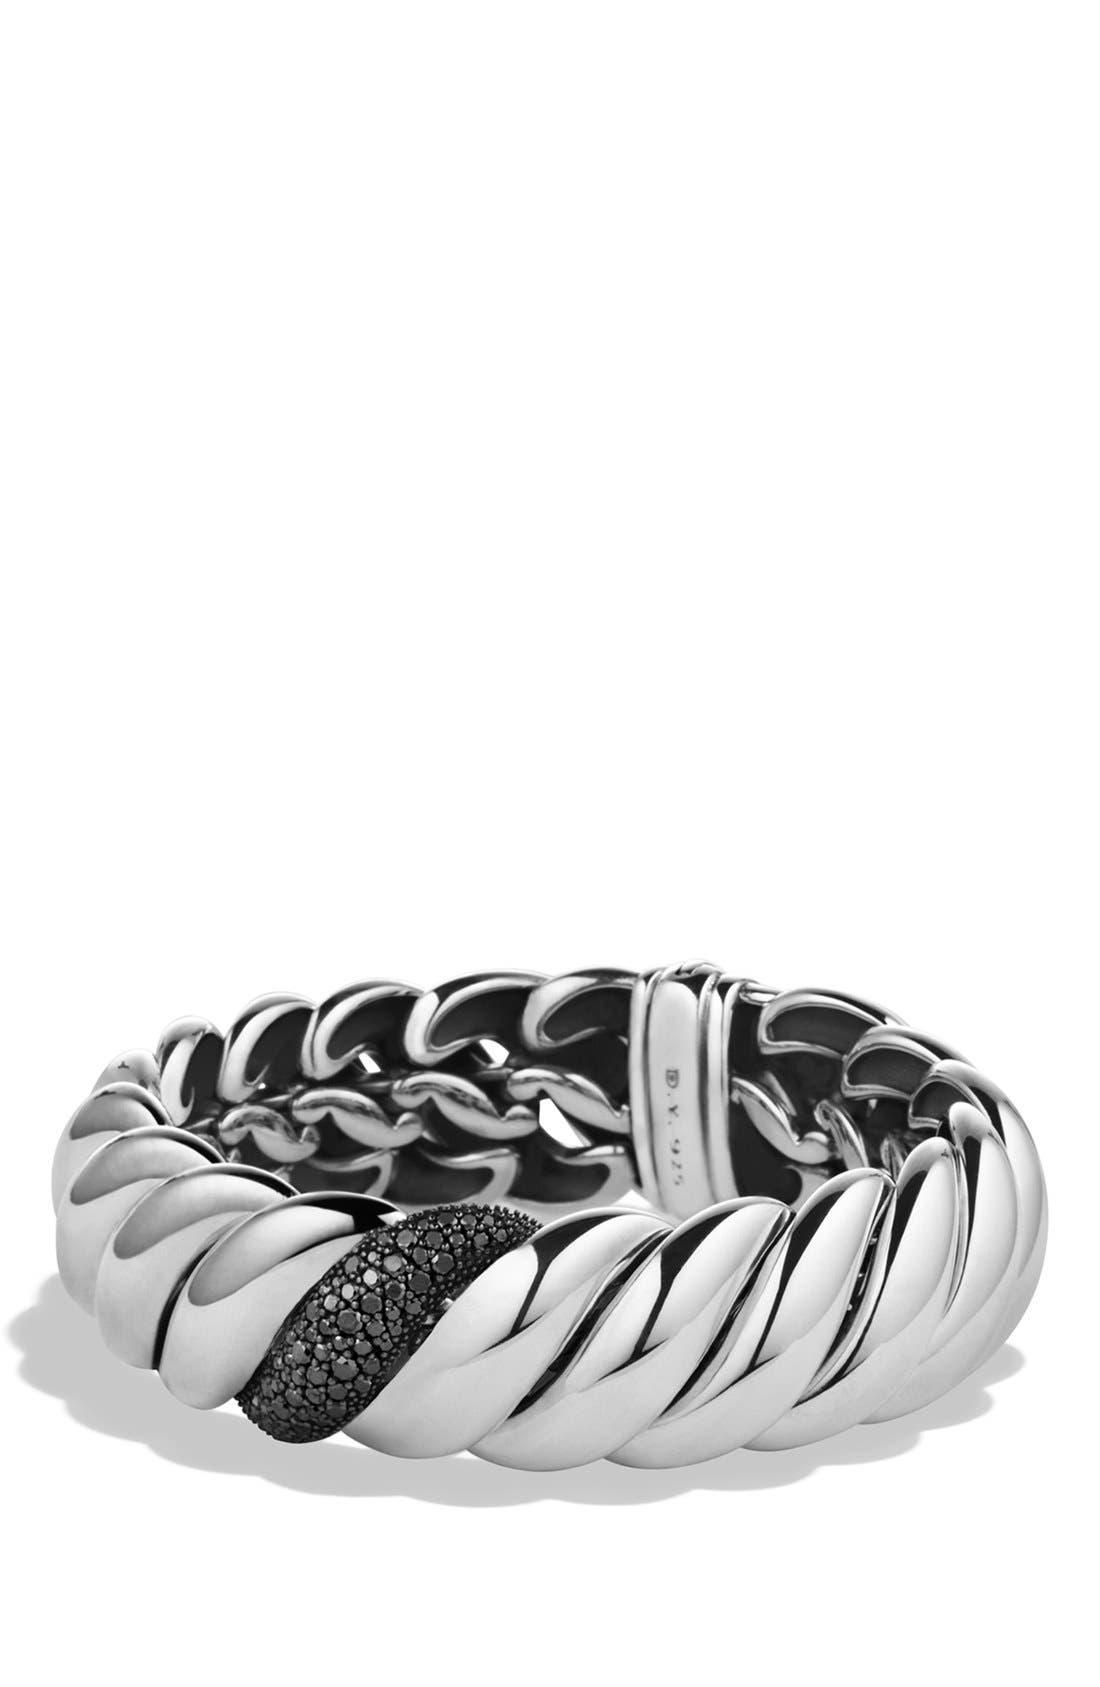 DAVID YURMAN 'Hampton' Cable Bracelet